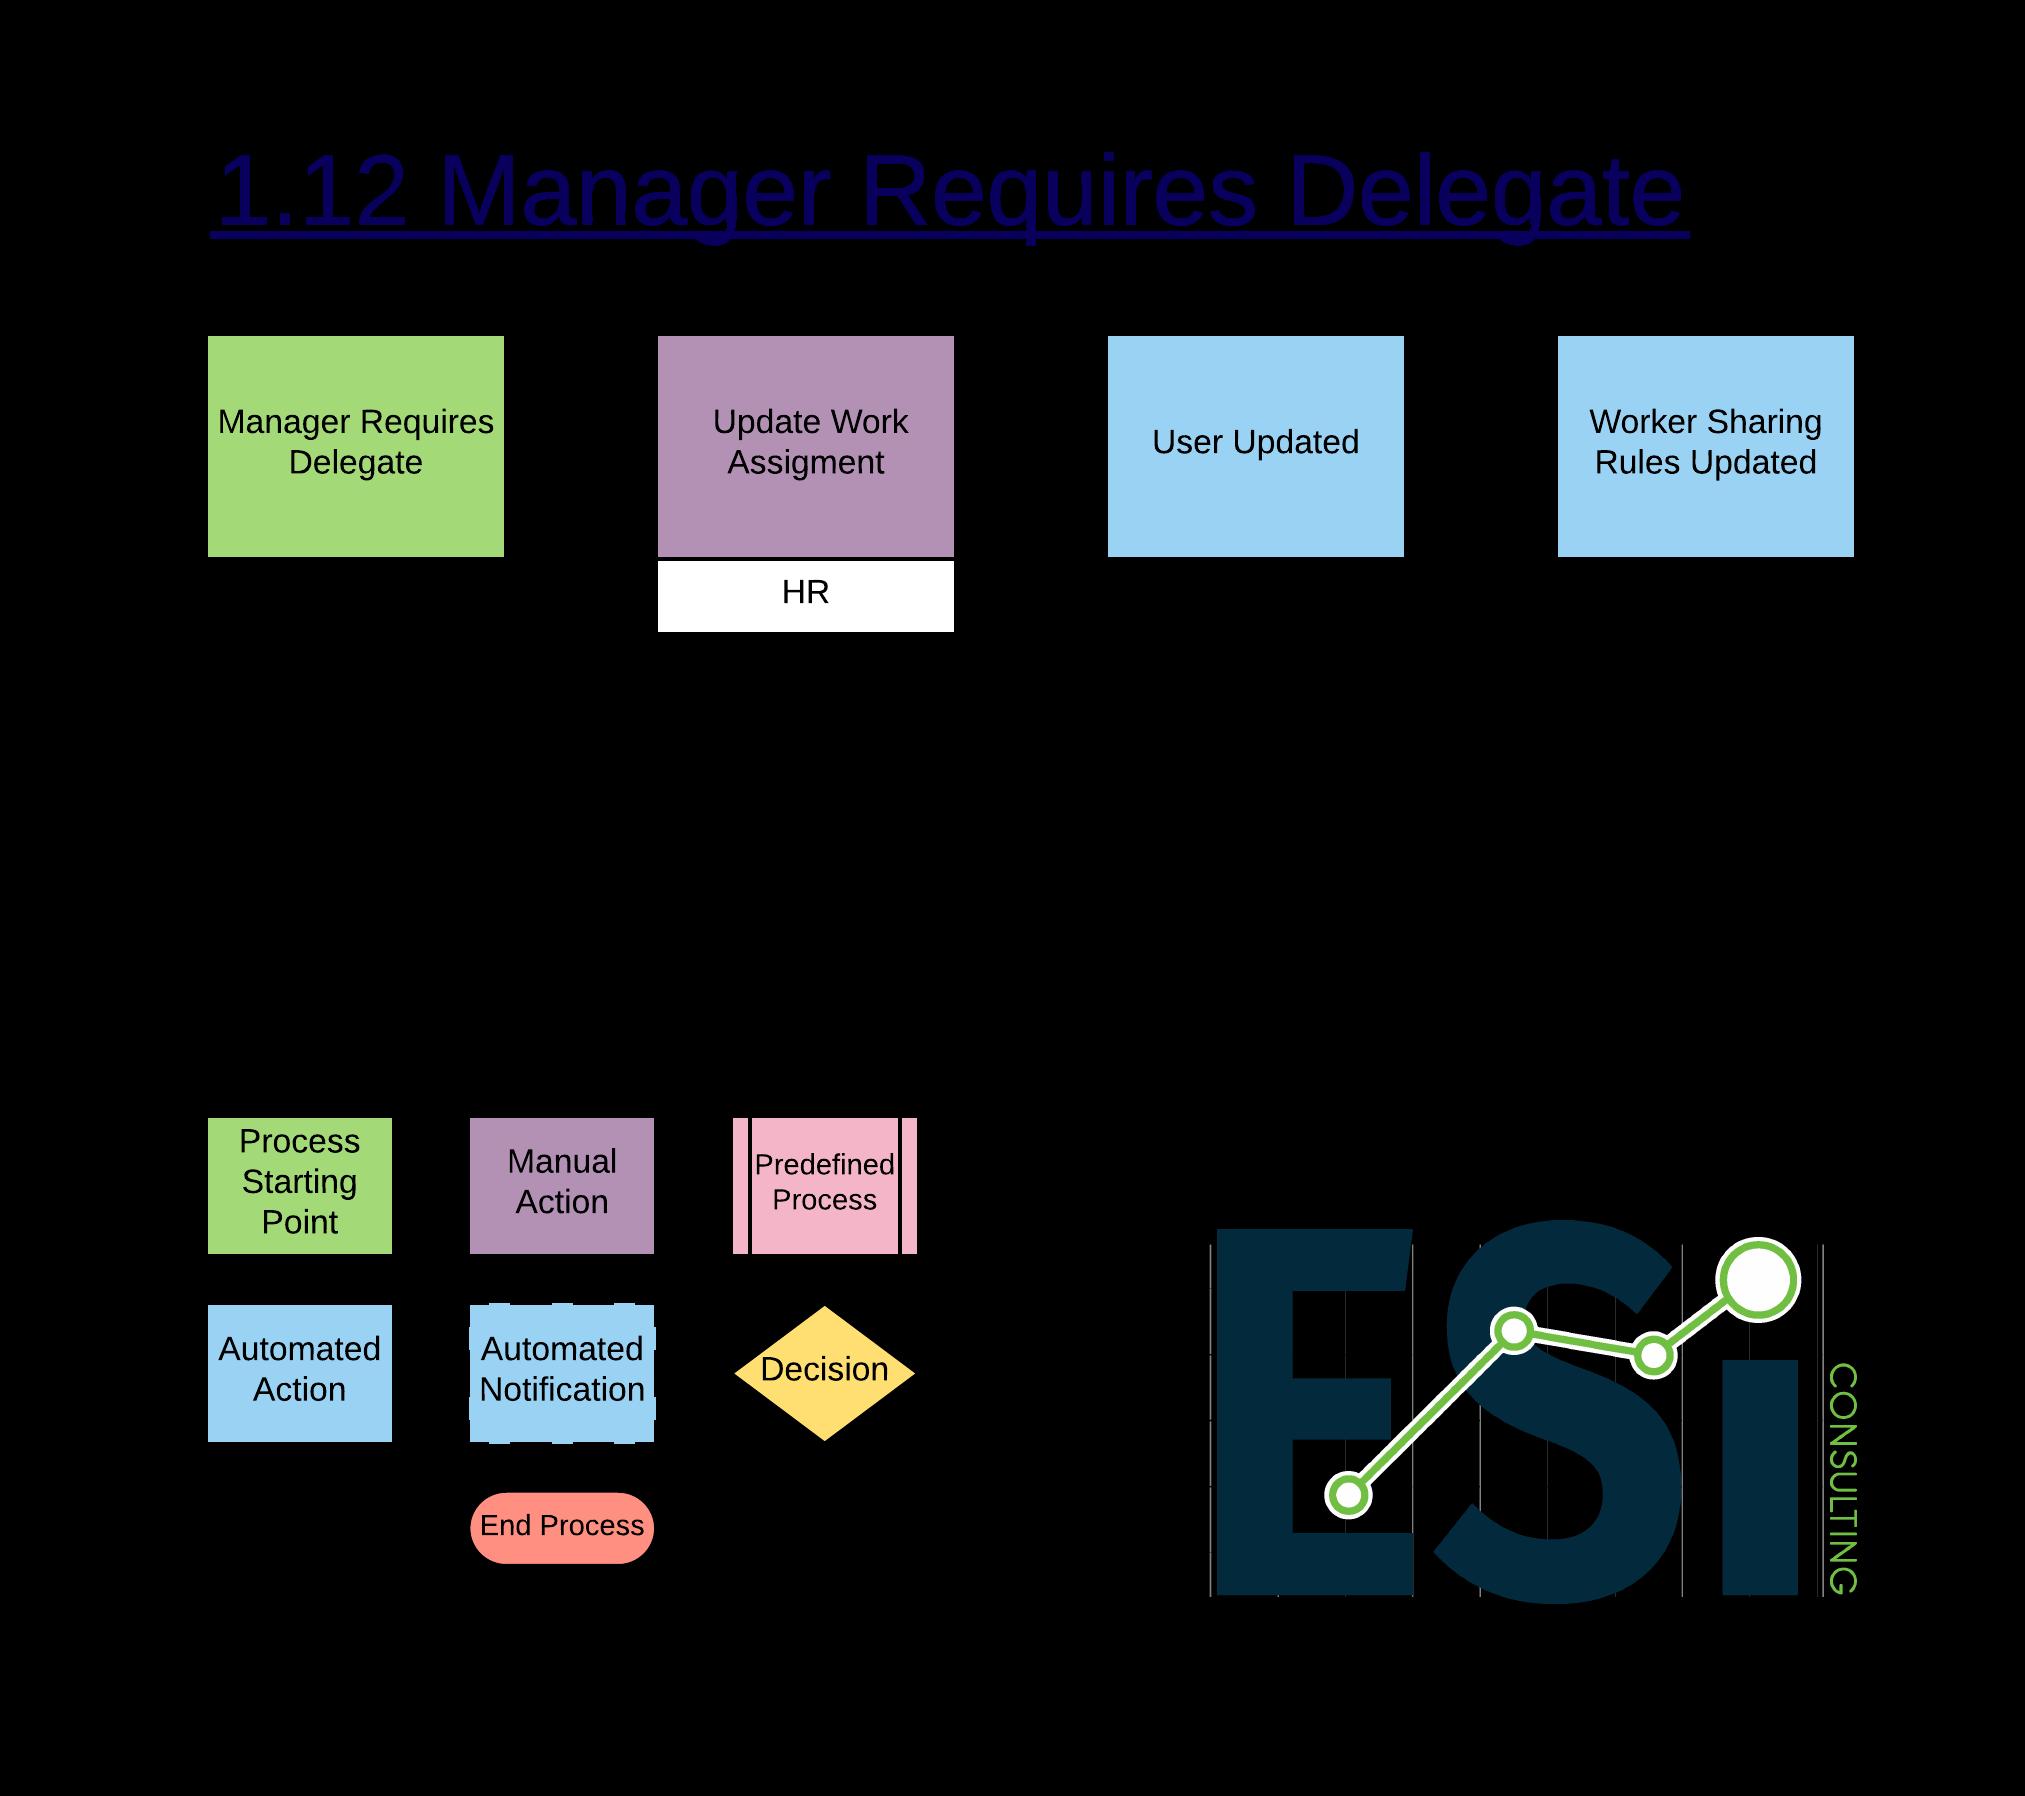 1.12 Manager Requires Delegate -